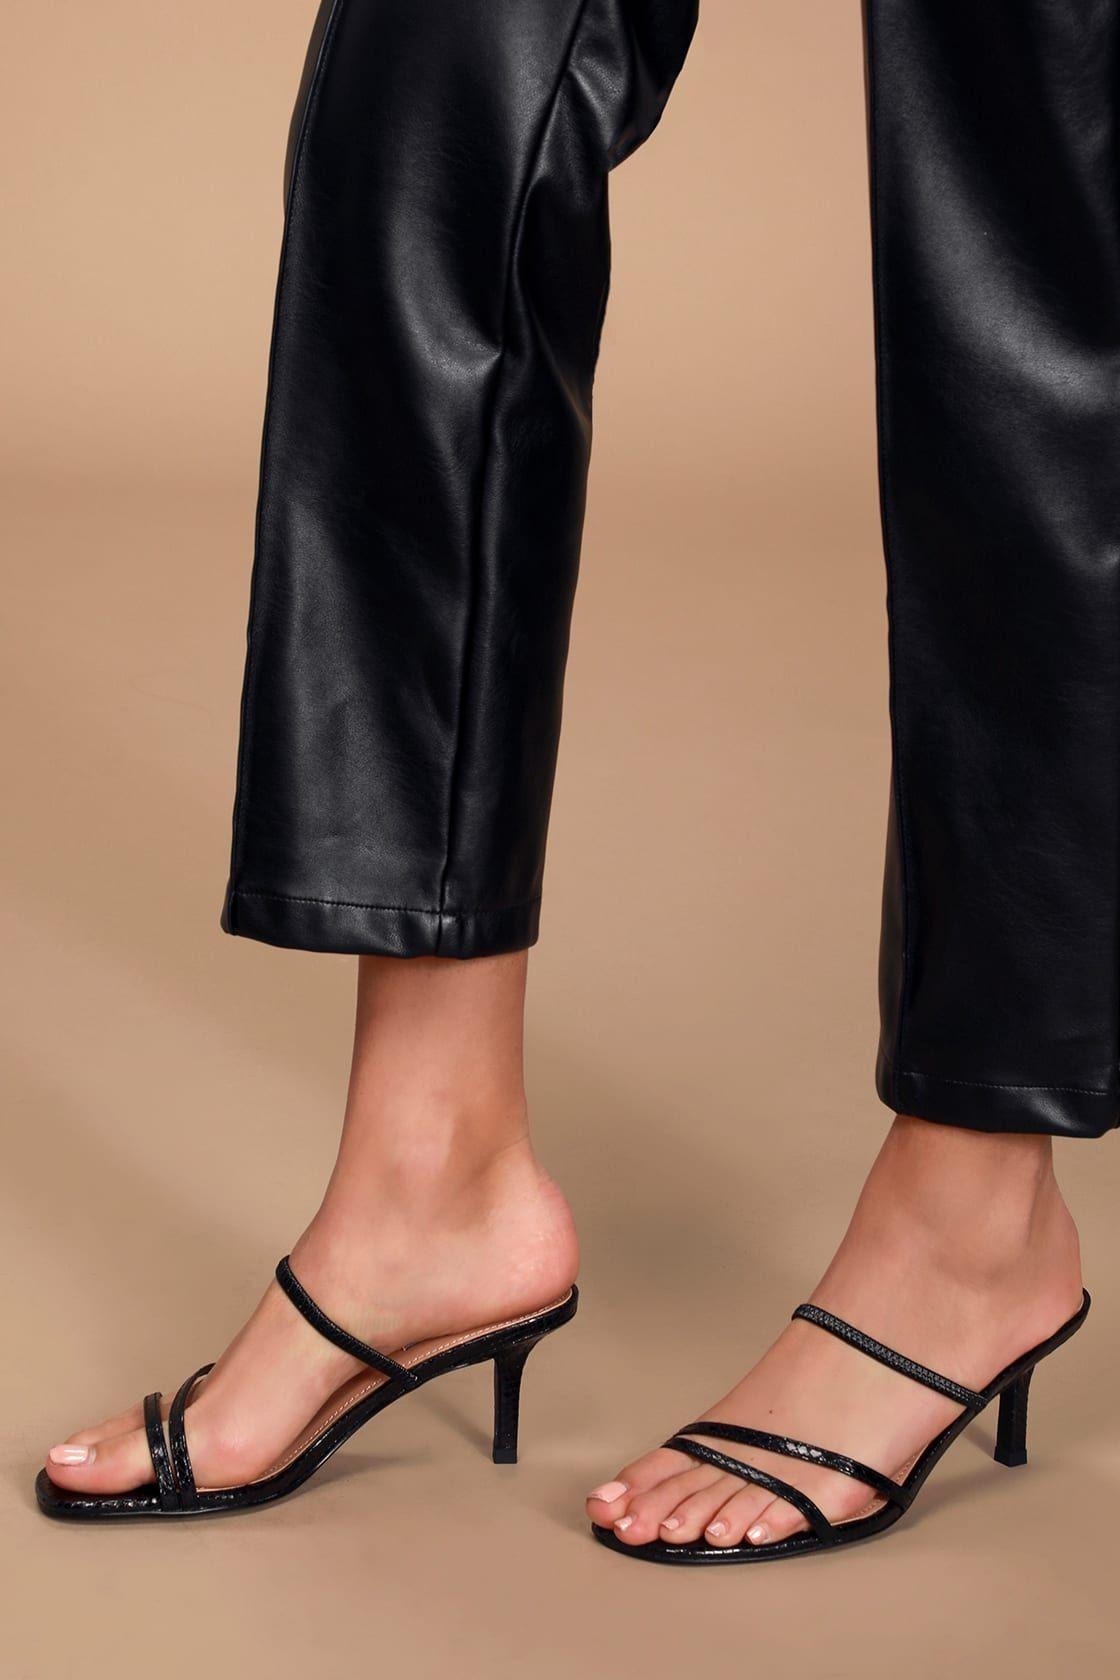 Loft Black Snake Strappy High Heel Sandals In 2020 Sandals Heels Strappy High Heels Sandals Strappy High Heels